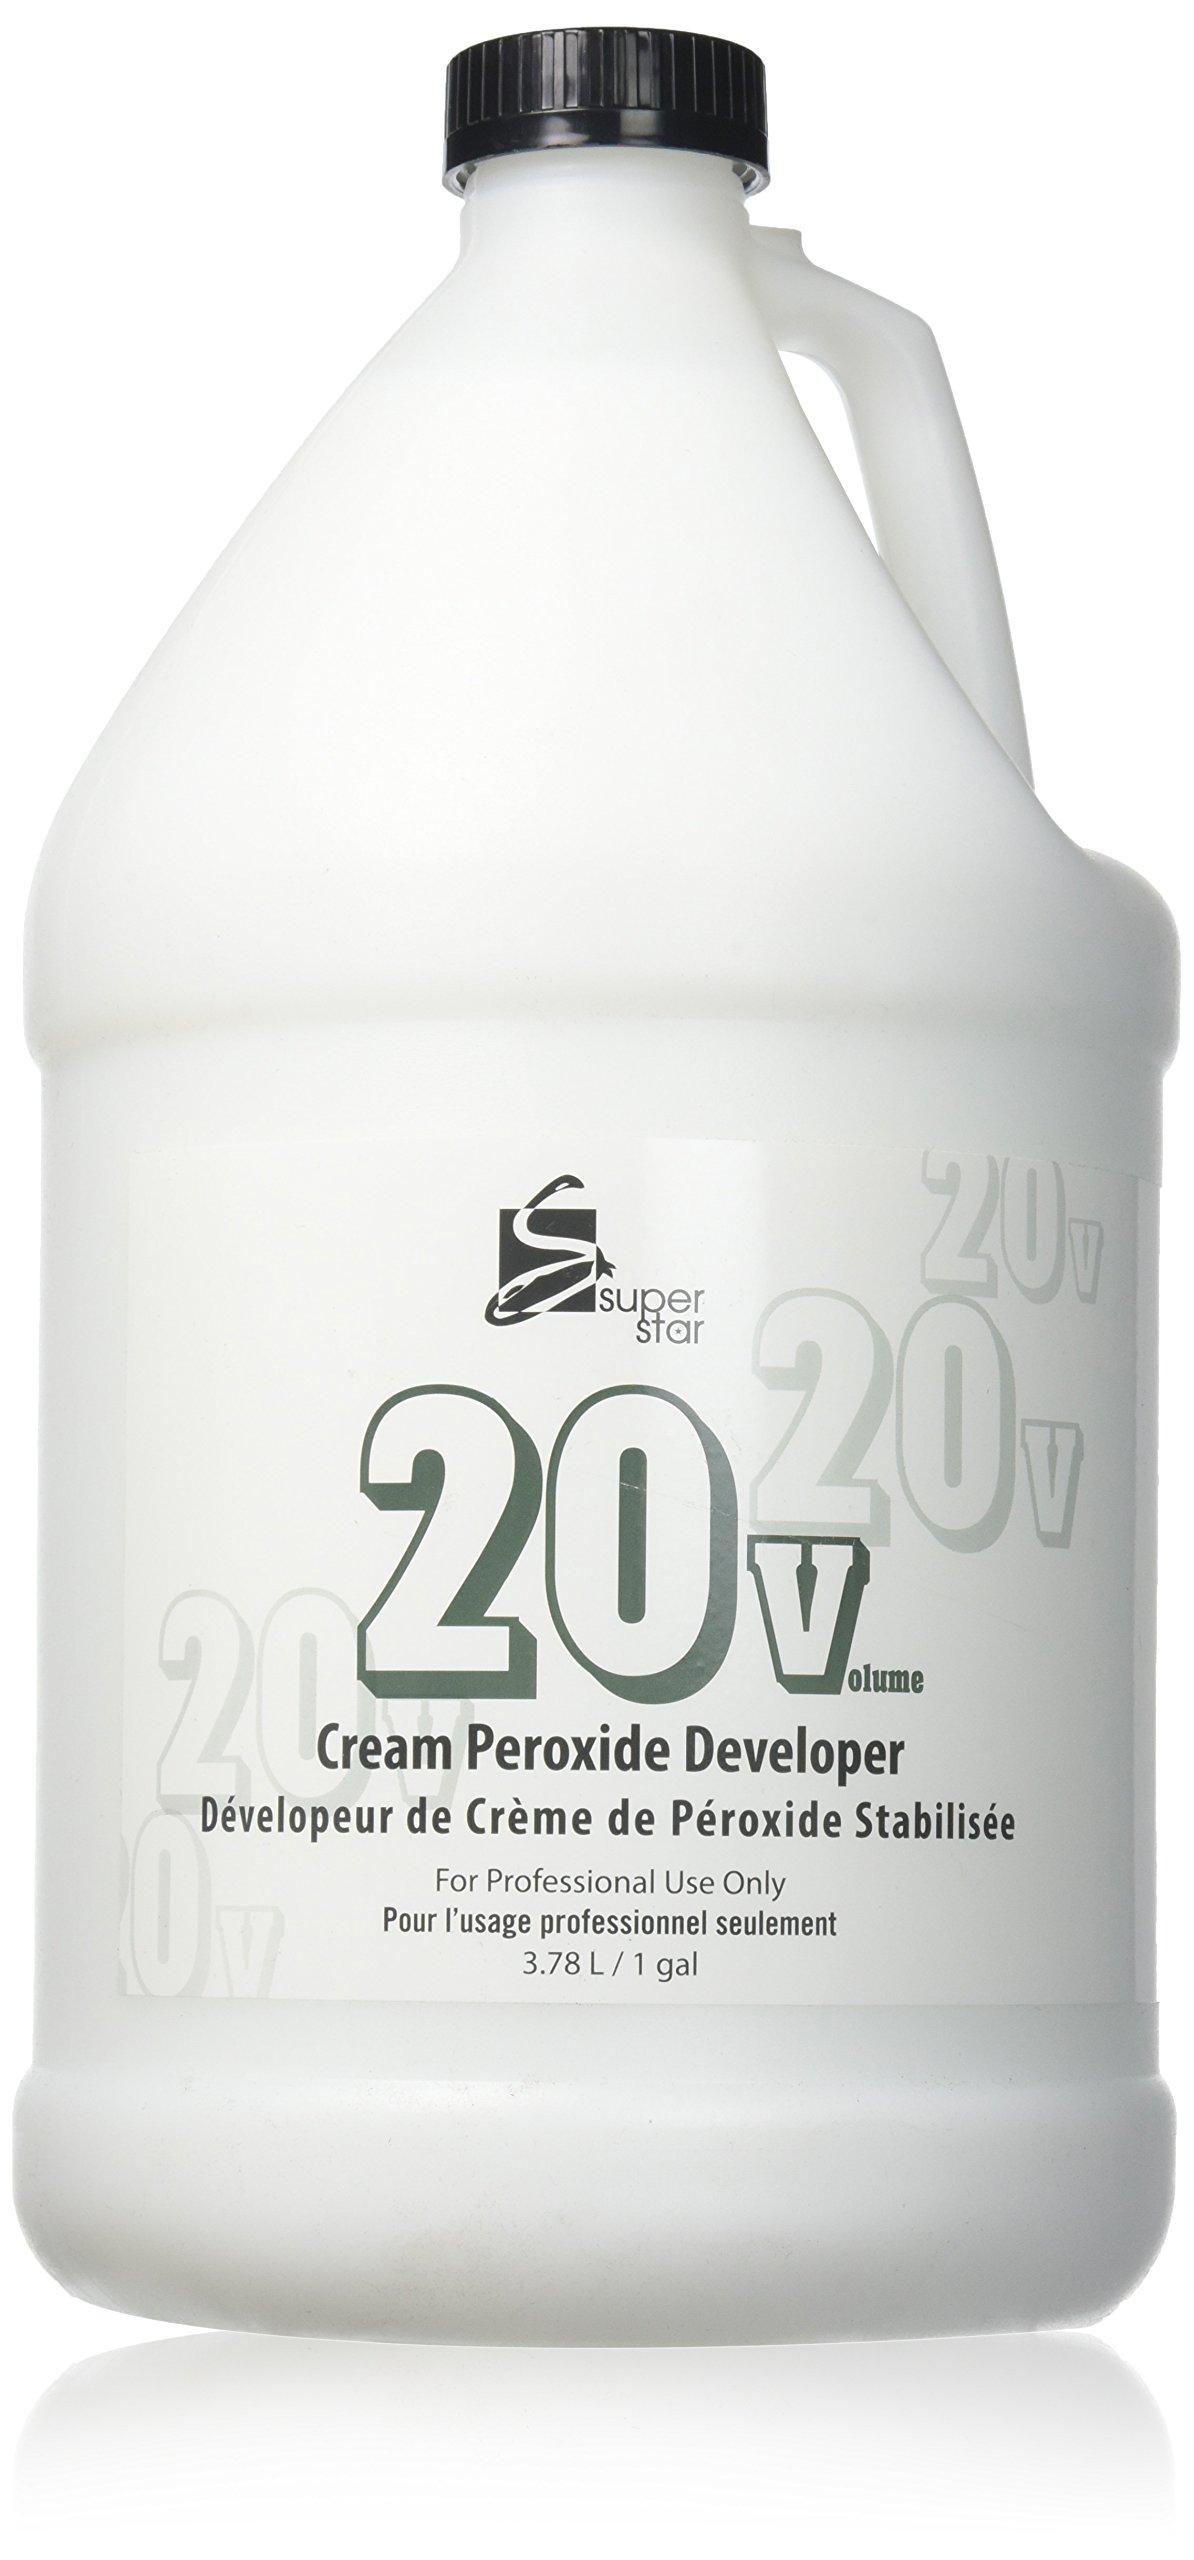 Super Star Stabilized Cream Peroxide Developer, 20v, 3.8 L / 1 Gallon (1-Count) by Superstar